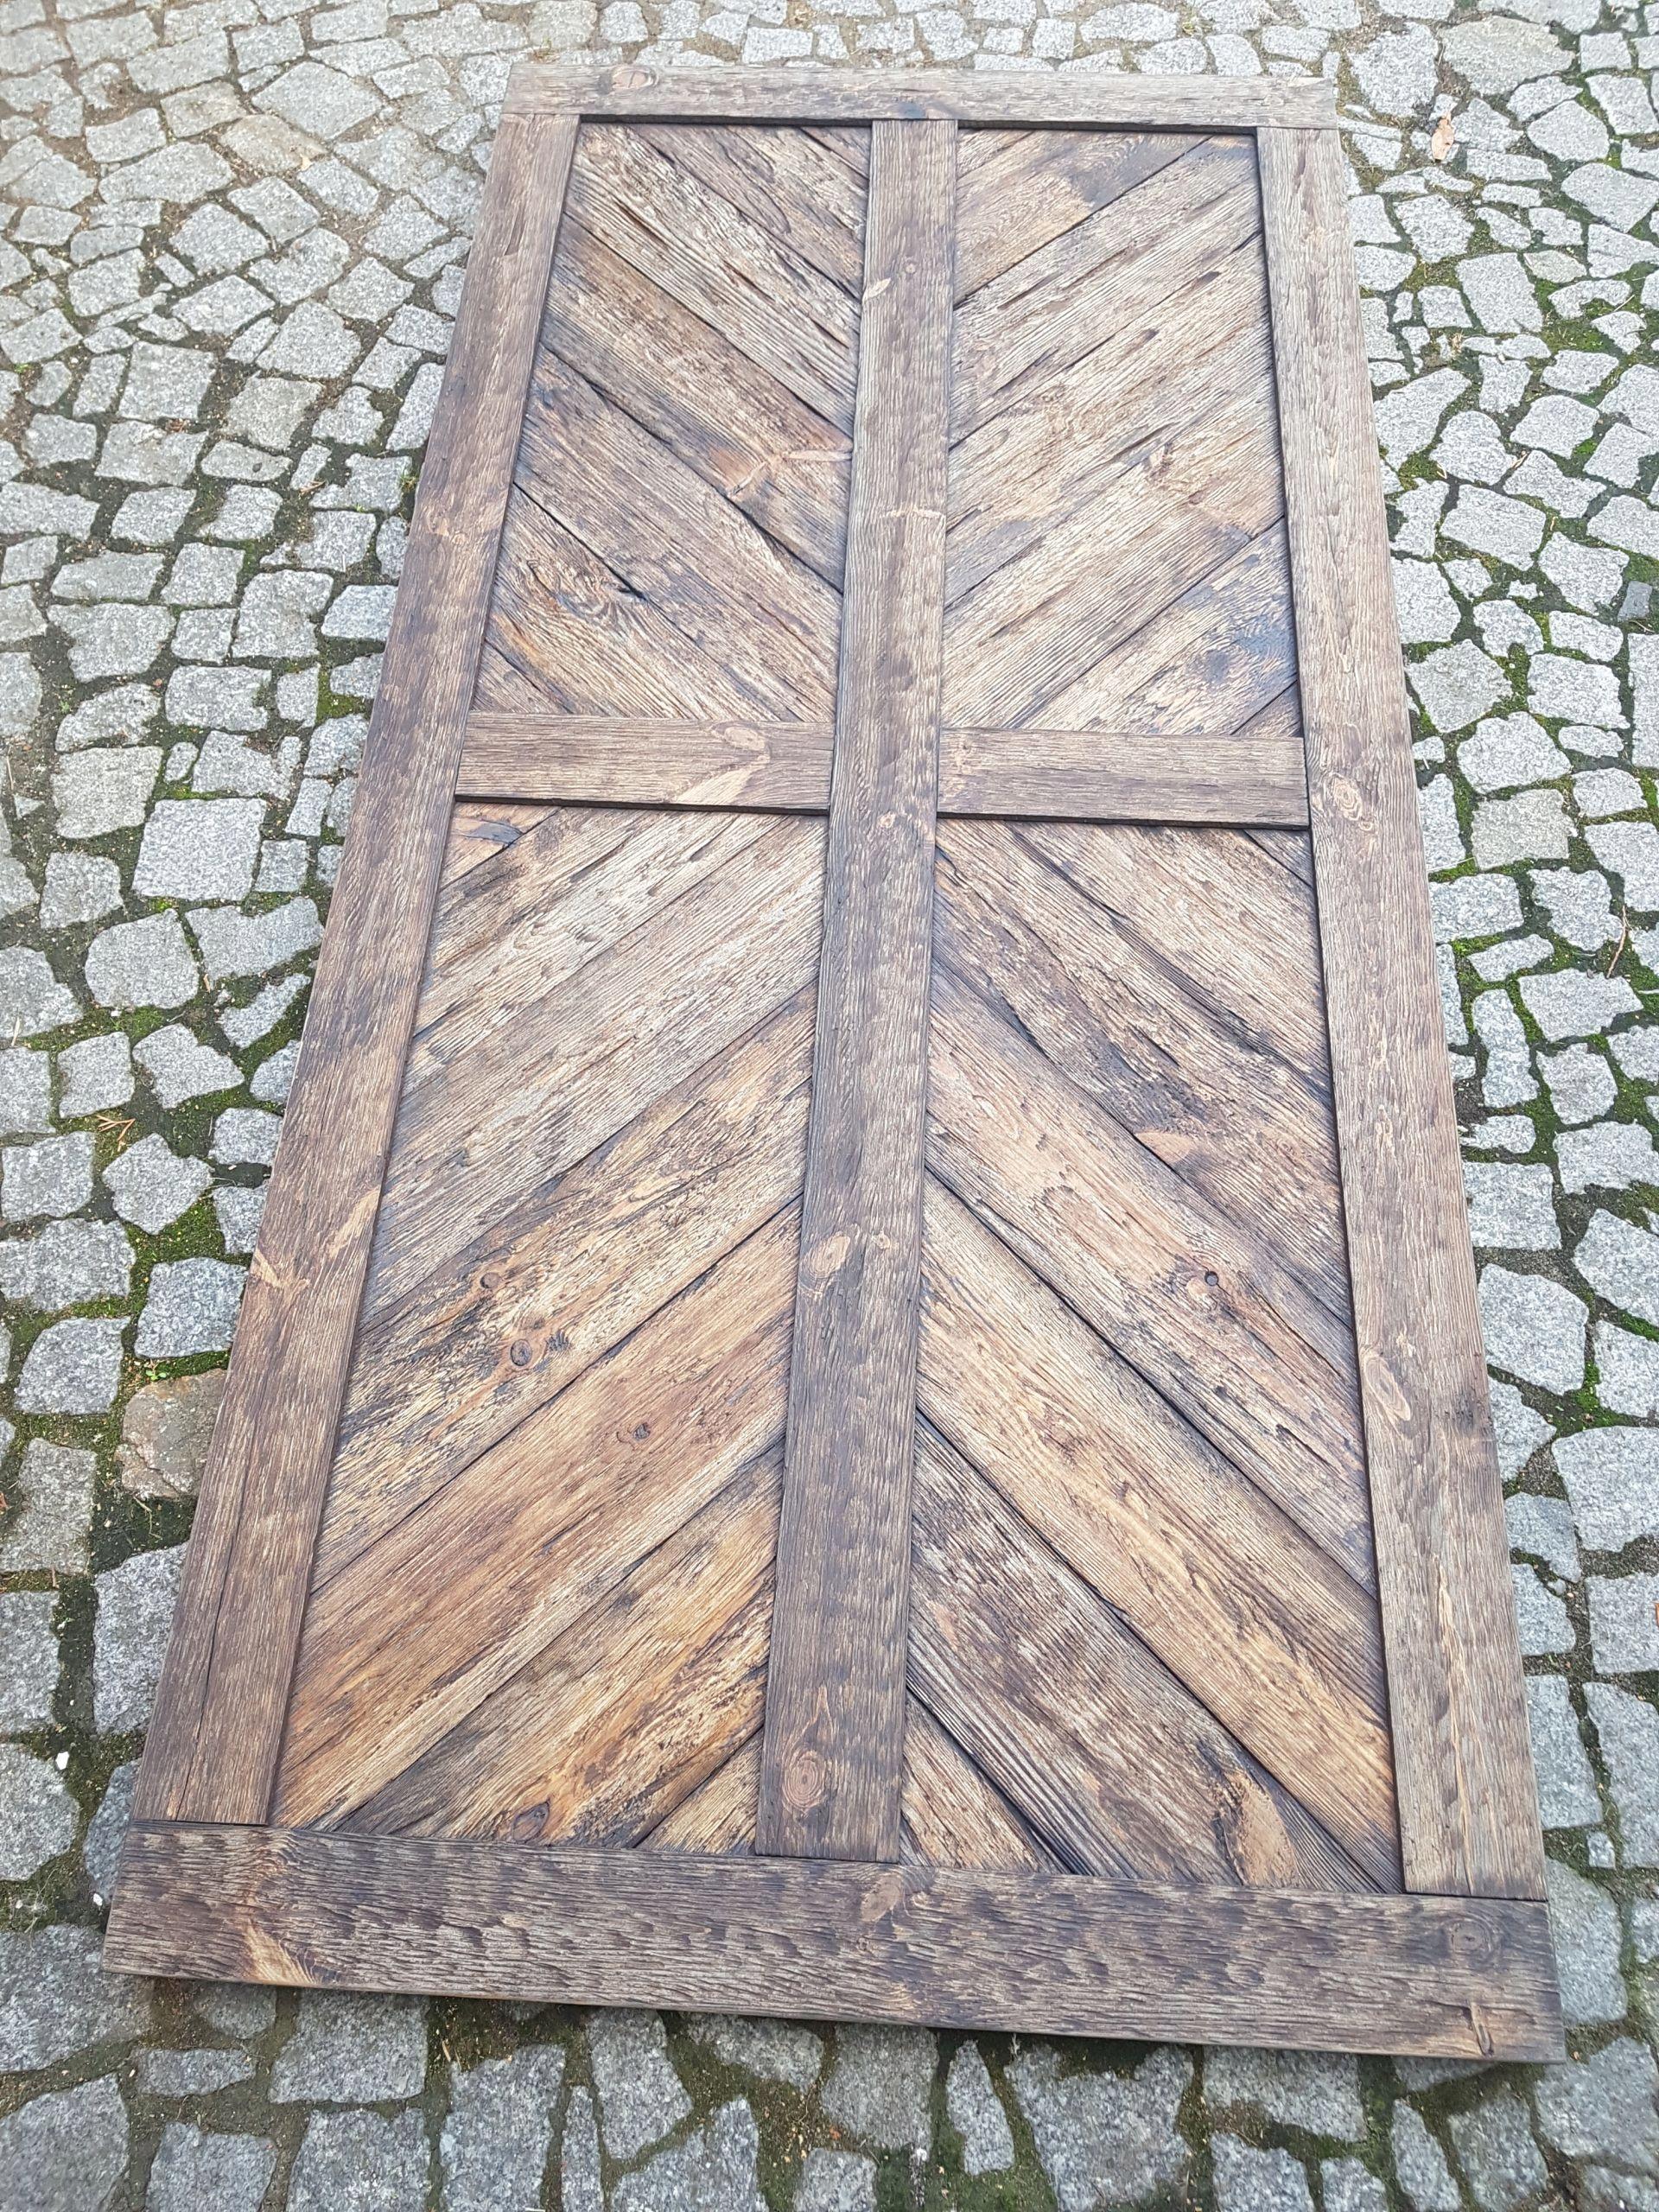 Posuvné dvere, stodola dvere, podlahy, retro, starzone